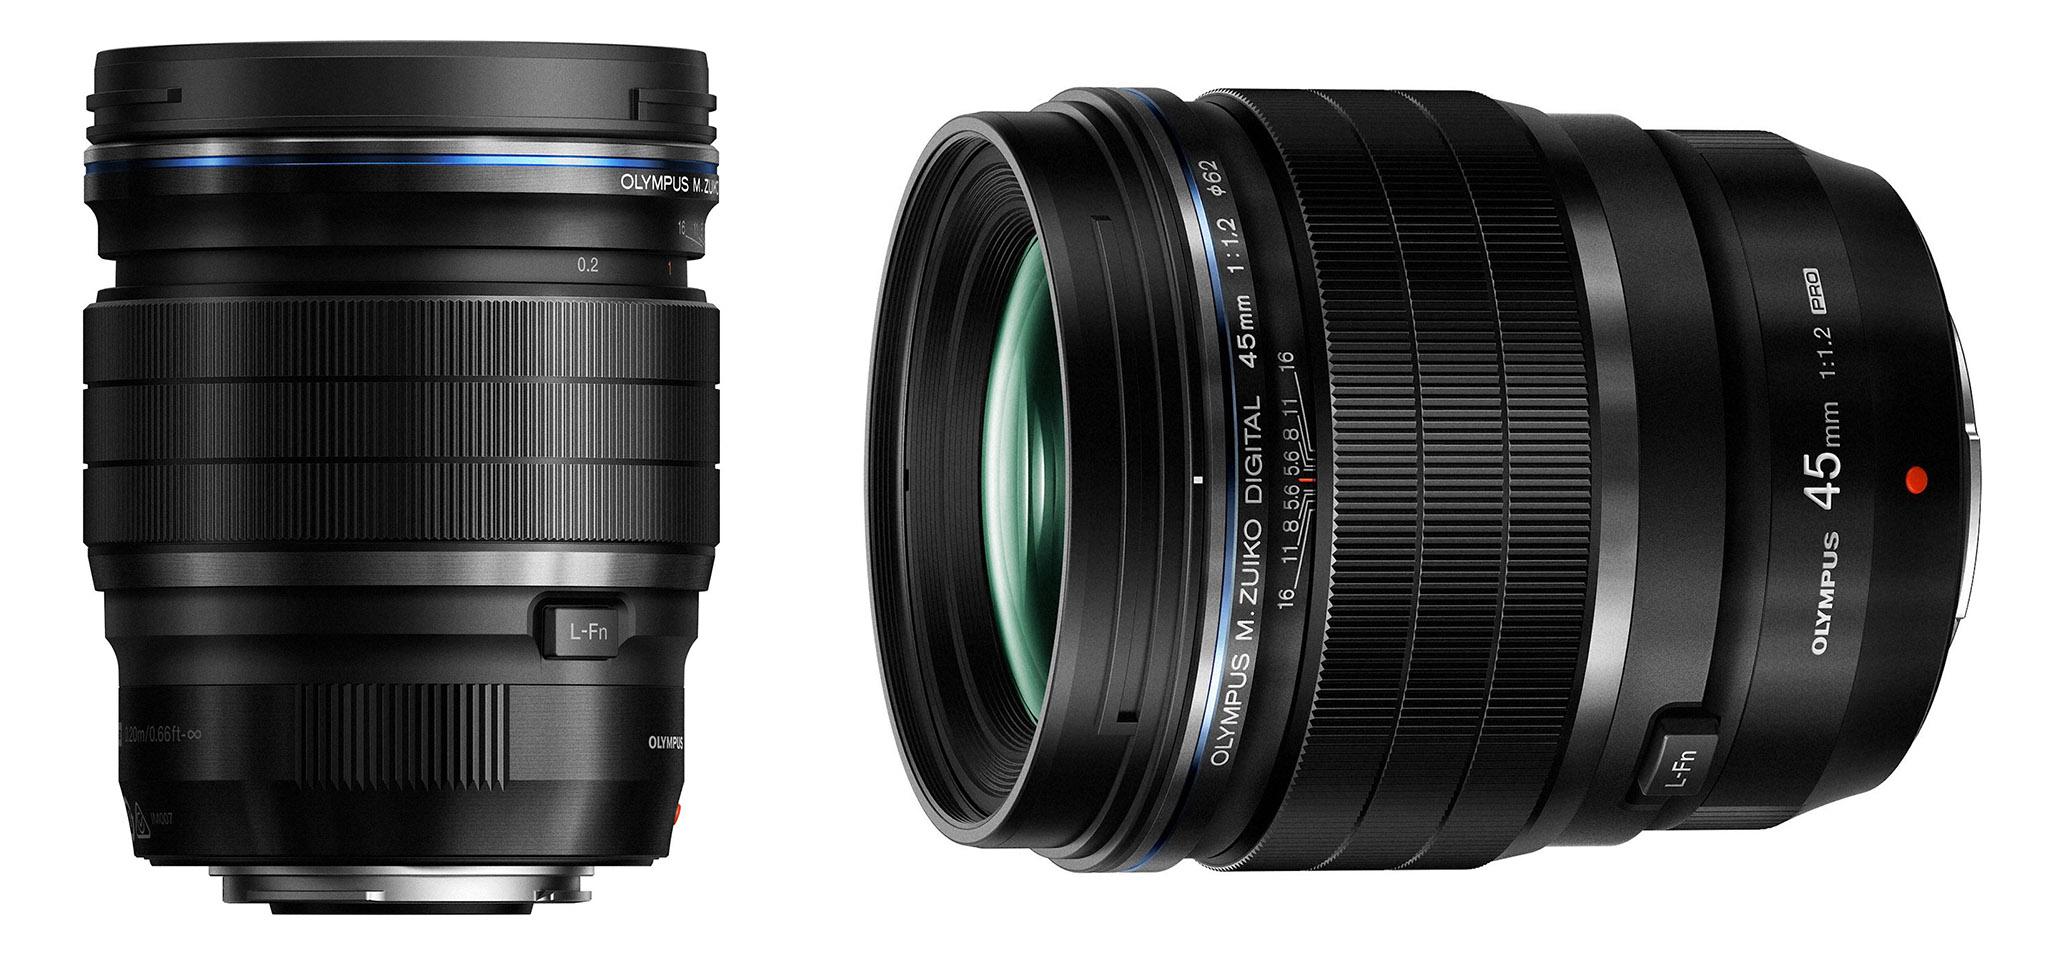 Olympus 17mm F1.2 45mm F1.2 tinhte.vn 6 copy2 .jpg